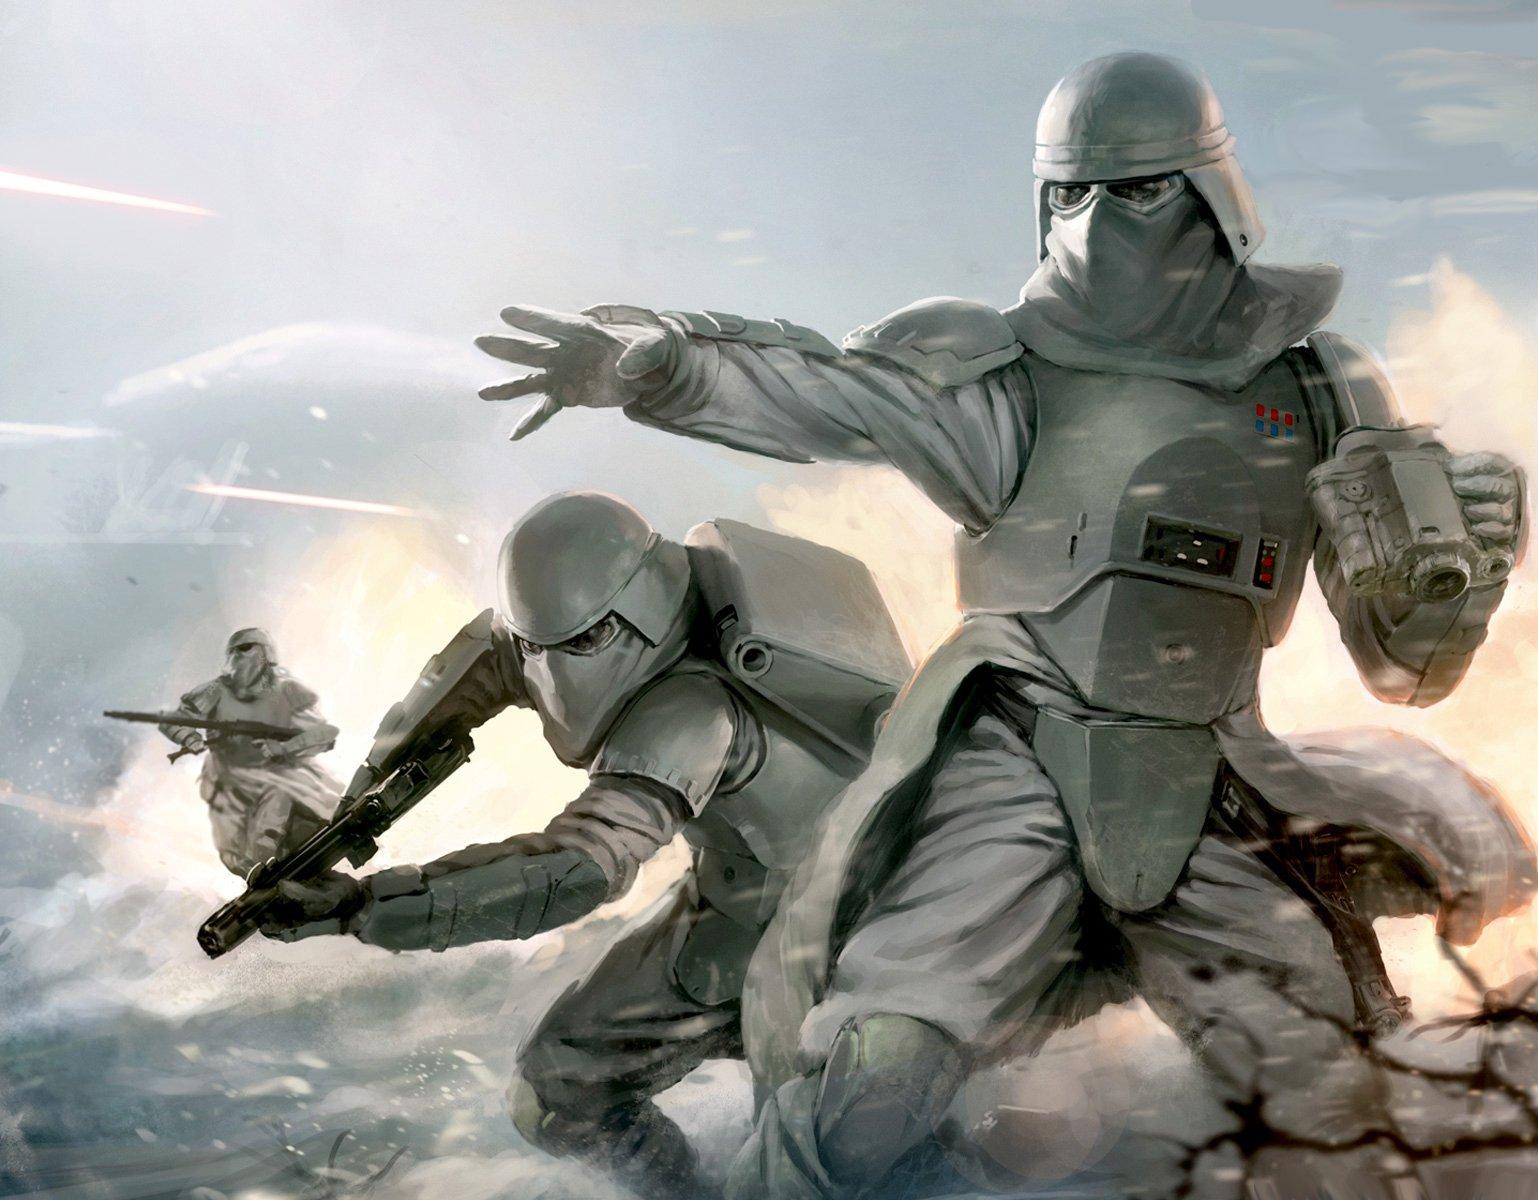 Star Wars Stormtroopers Fantasy Art Artwork Bwing Down: Star Wars Fond D'écran And Arrière-Plan